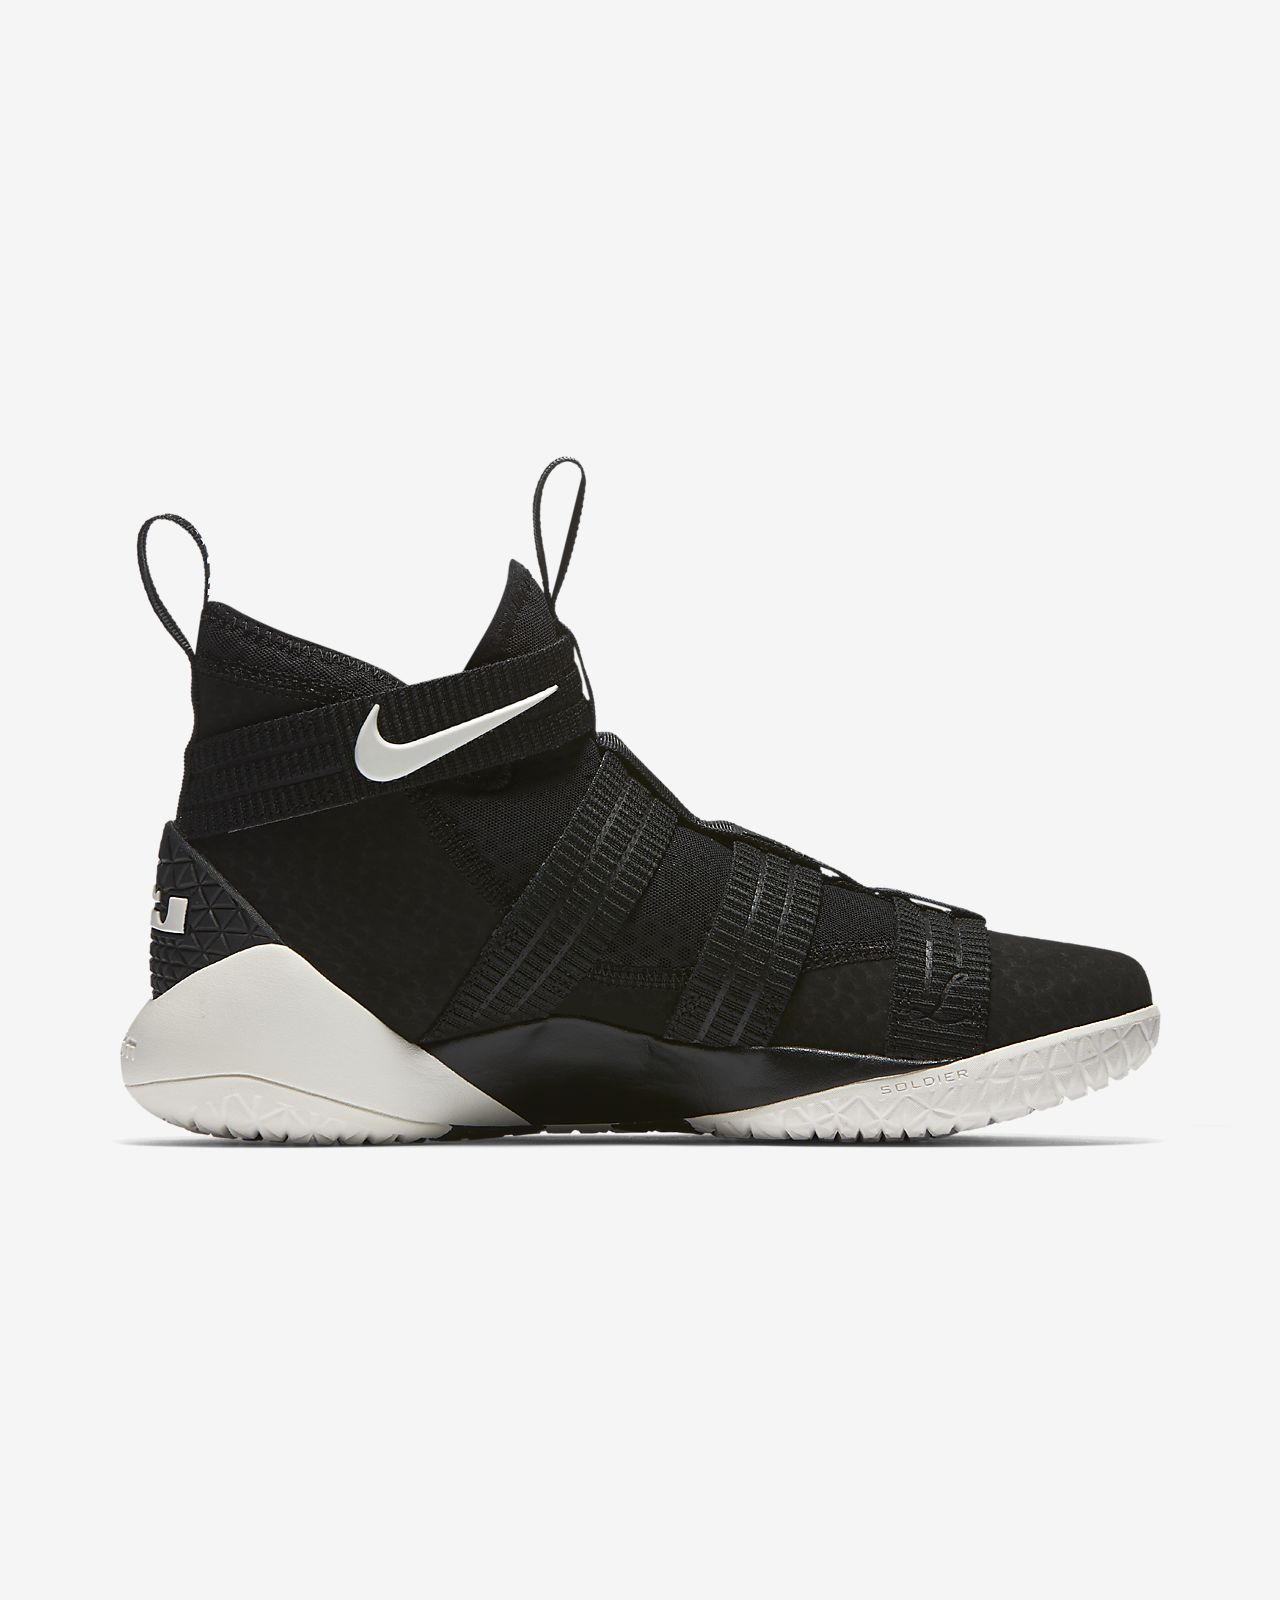 d8432f1c523 LeBron Soldier XI SFG Basketball Shoe. Nike.com IN